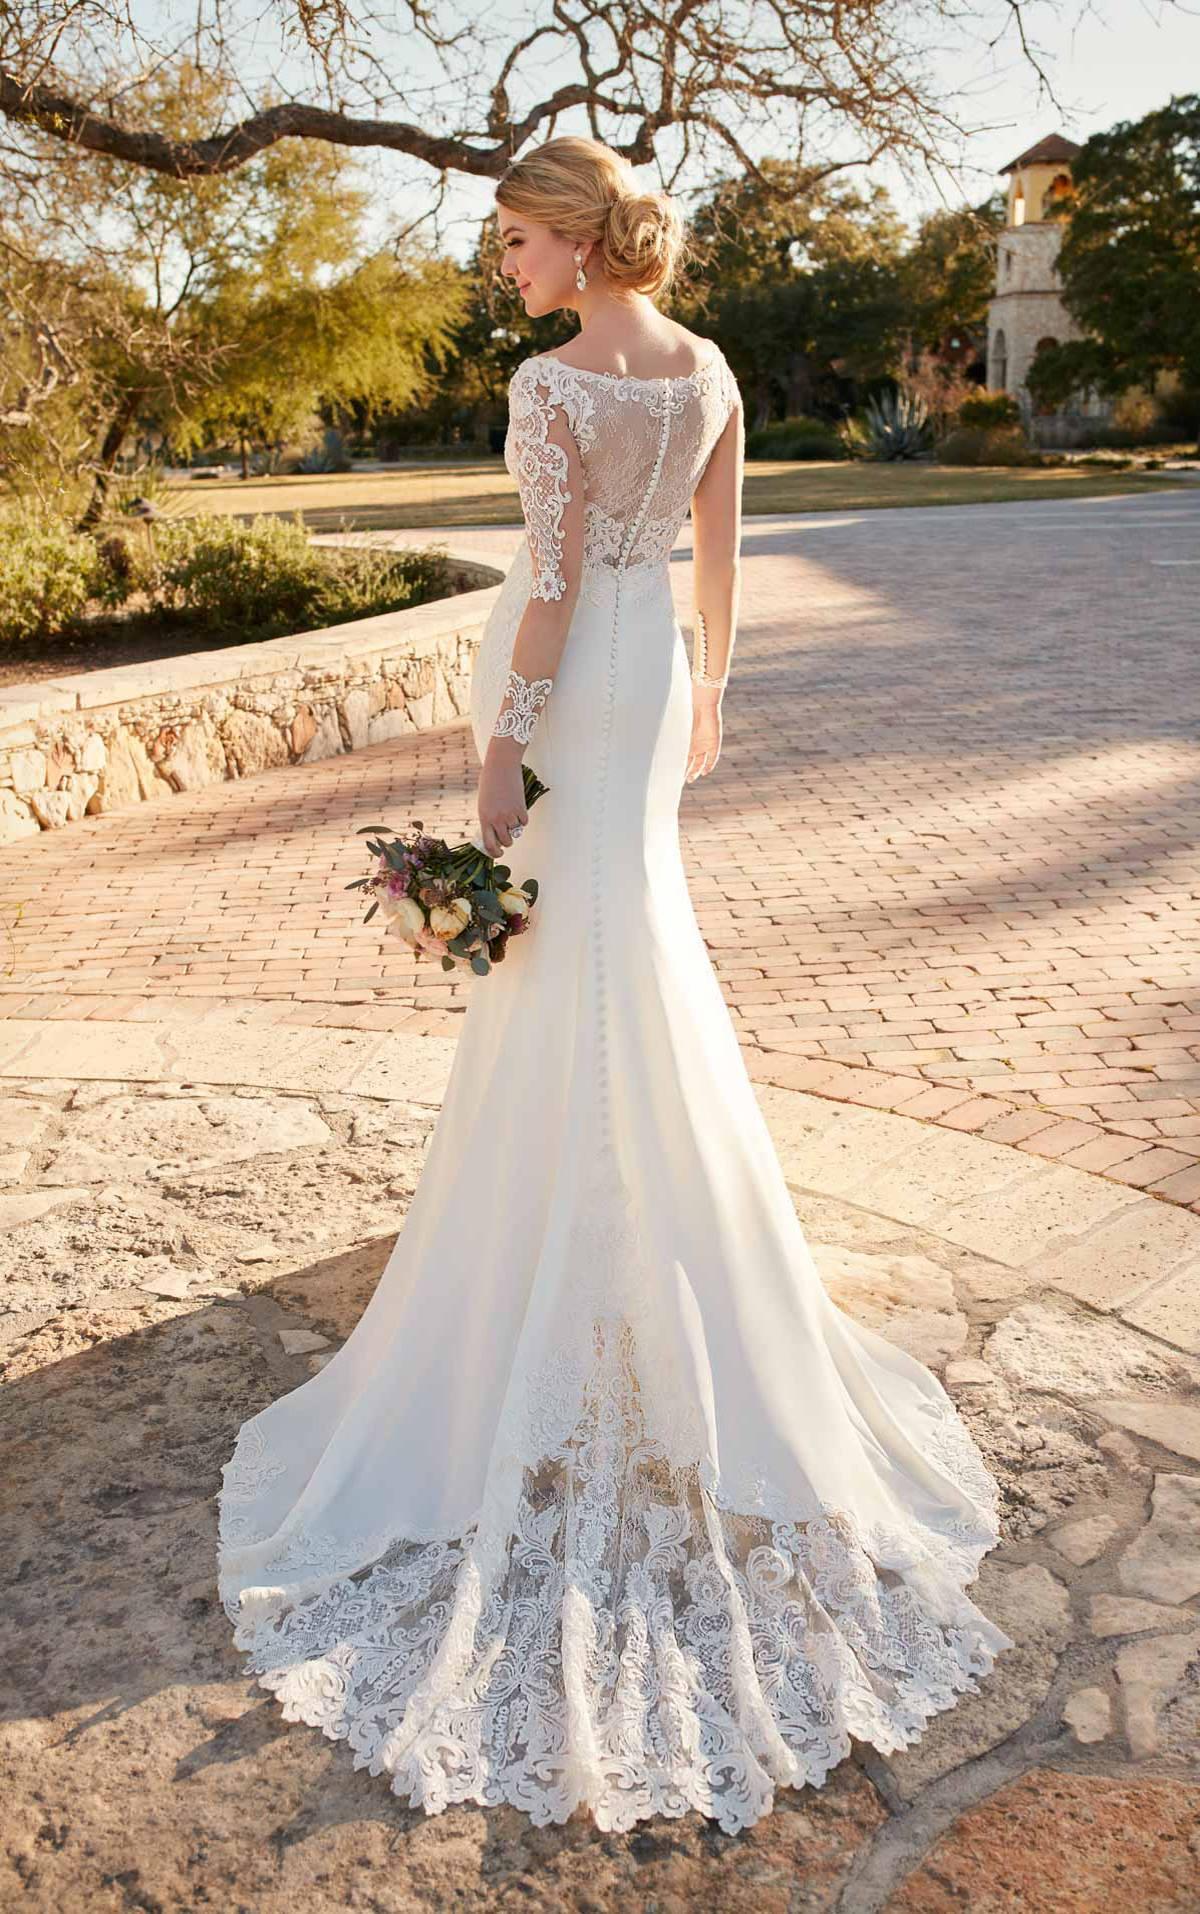 Wedding Dress Shop Melton Mowbray